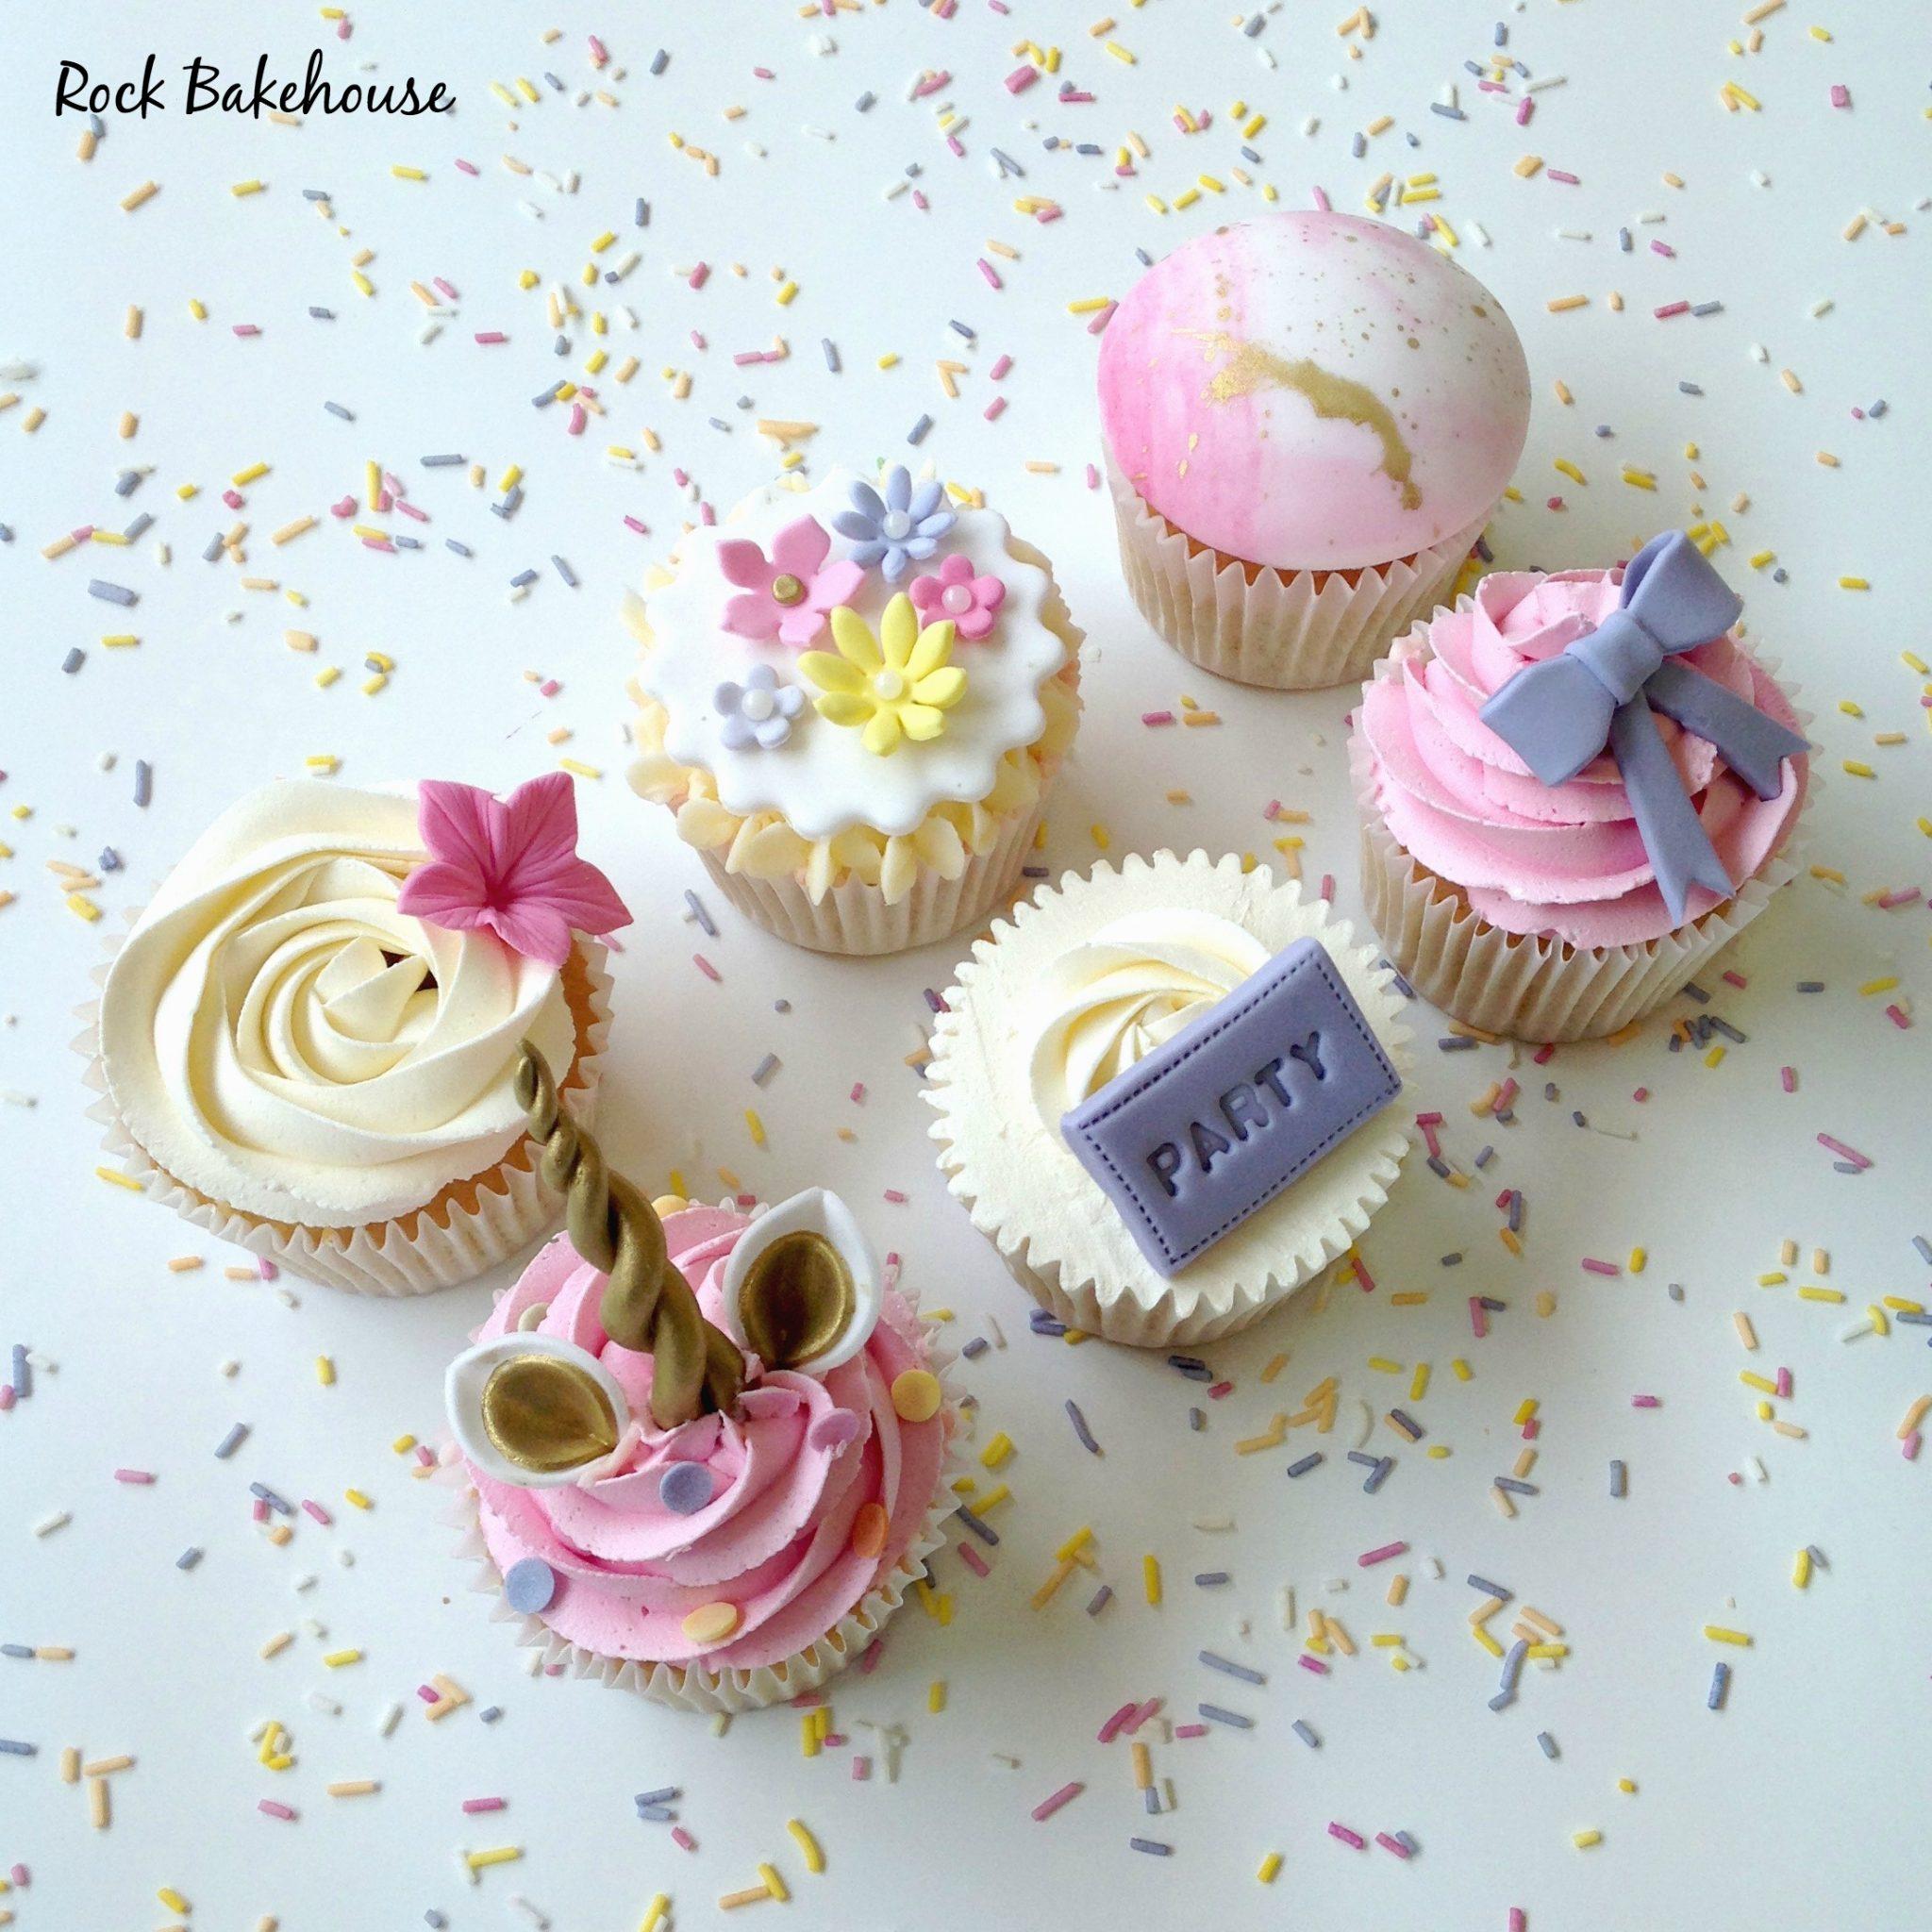 Cupcake Decorating Classes | Rock Bakehouse